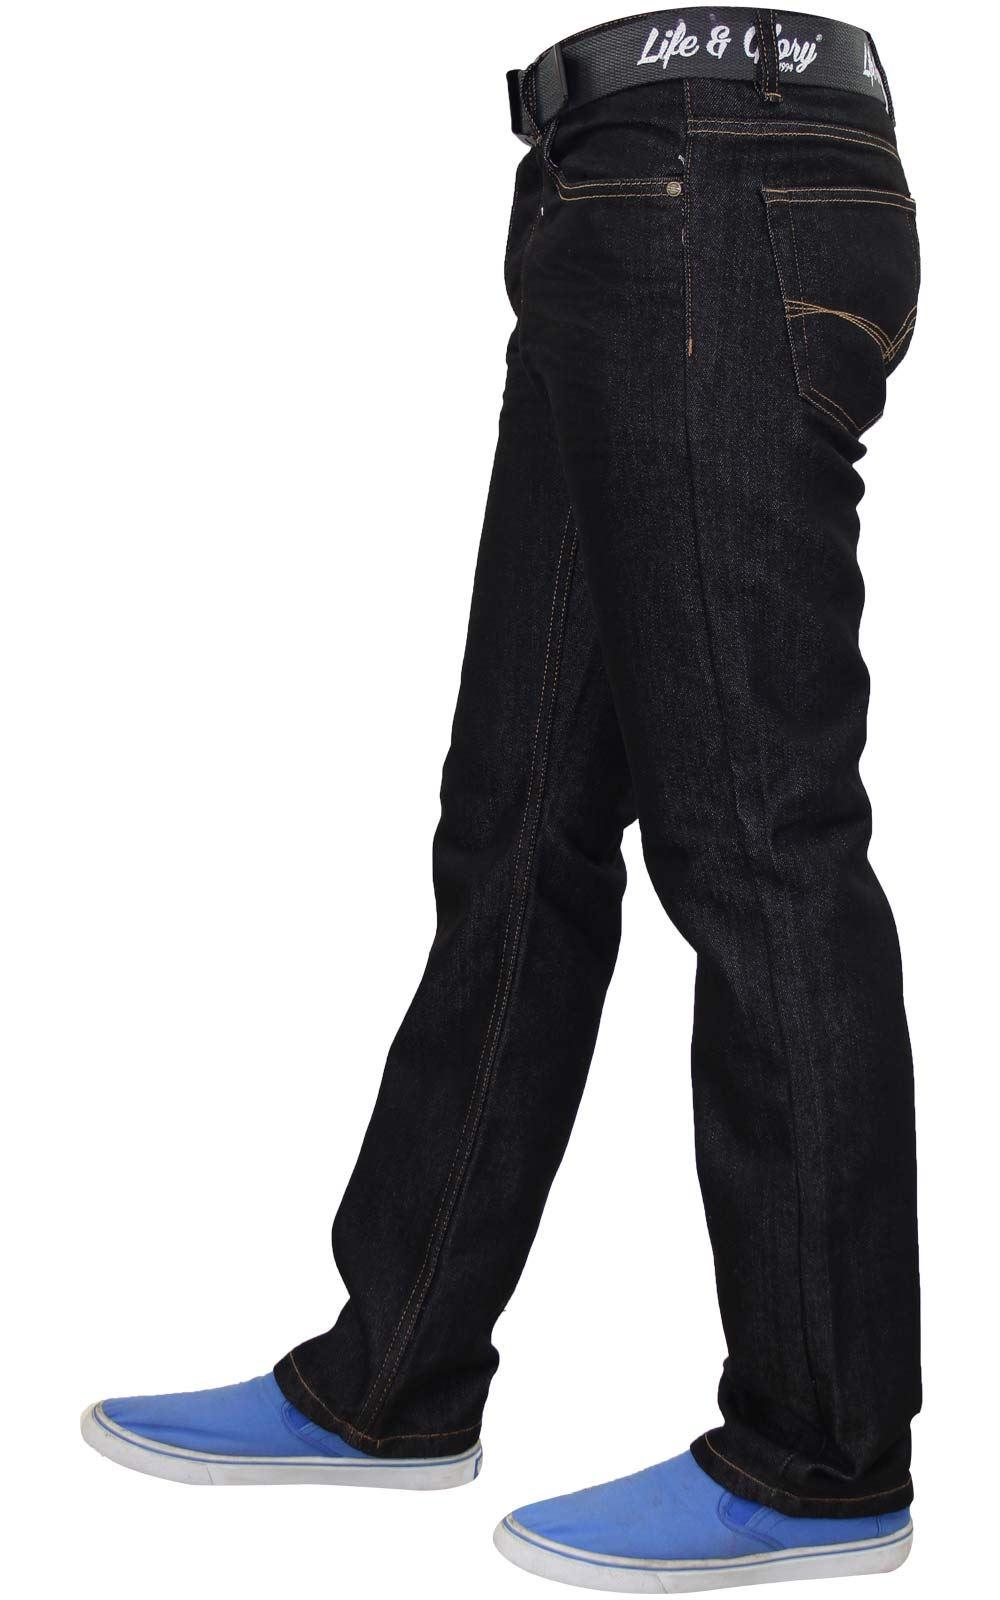 Mens-Regular-Fit-Jeans-Straight-Leg-Denim-Pants-Casual-Trousers-With-Free-Belt thumbnail 5